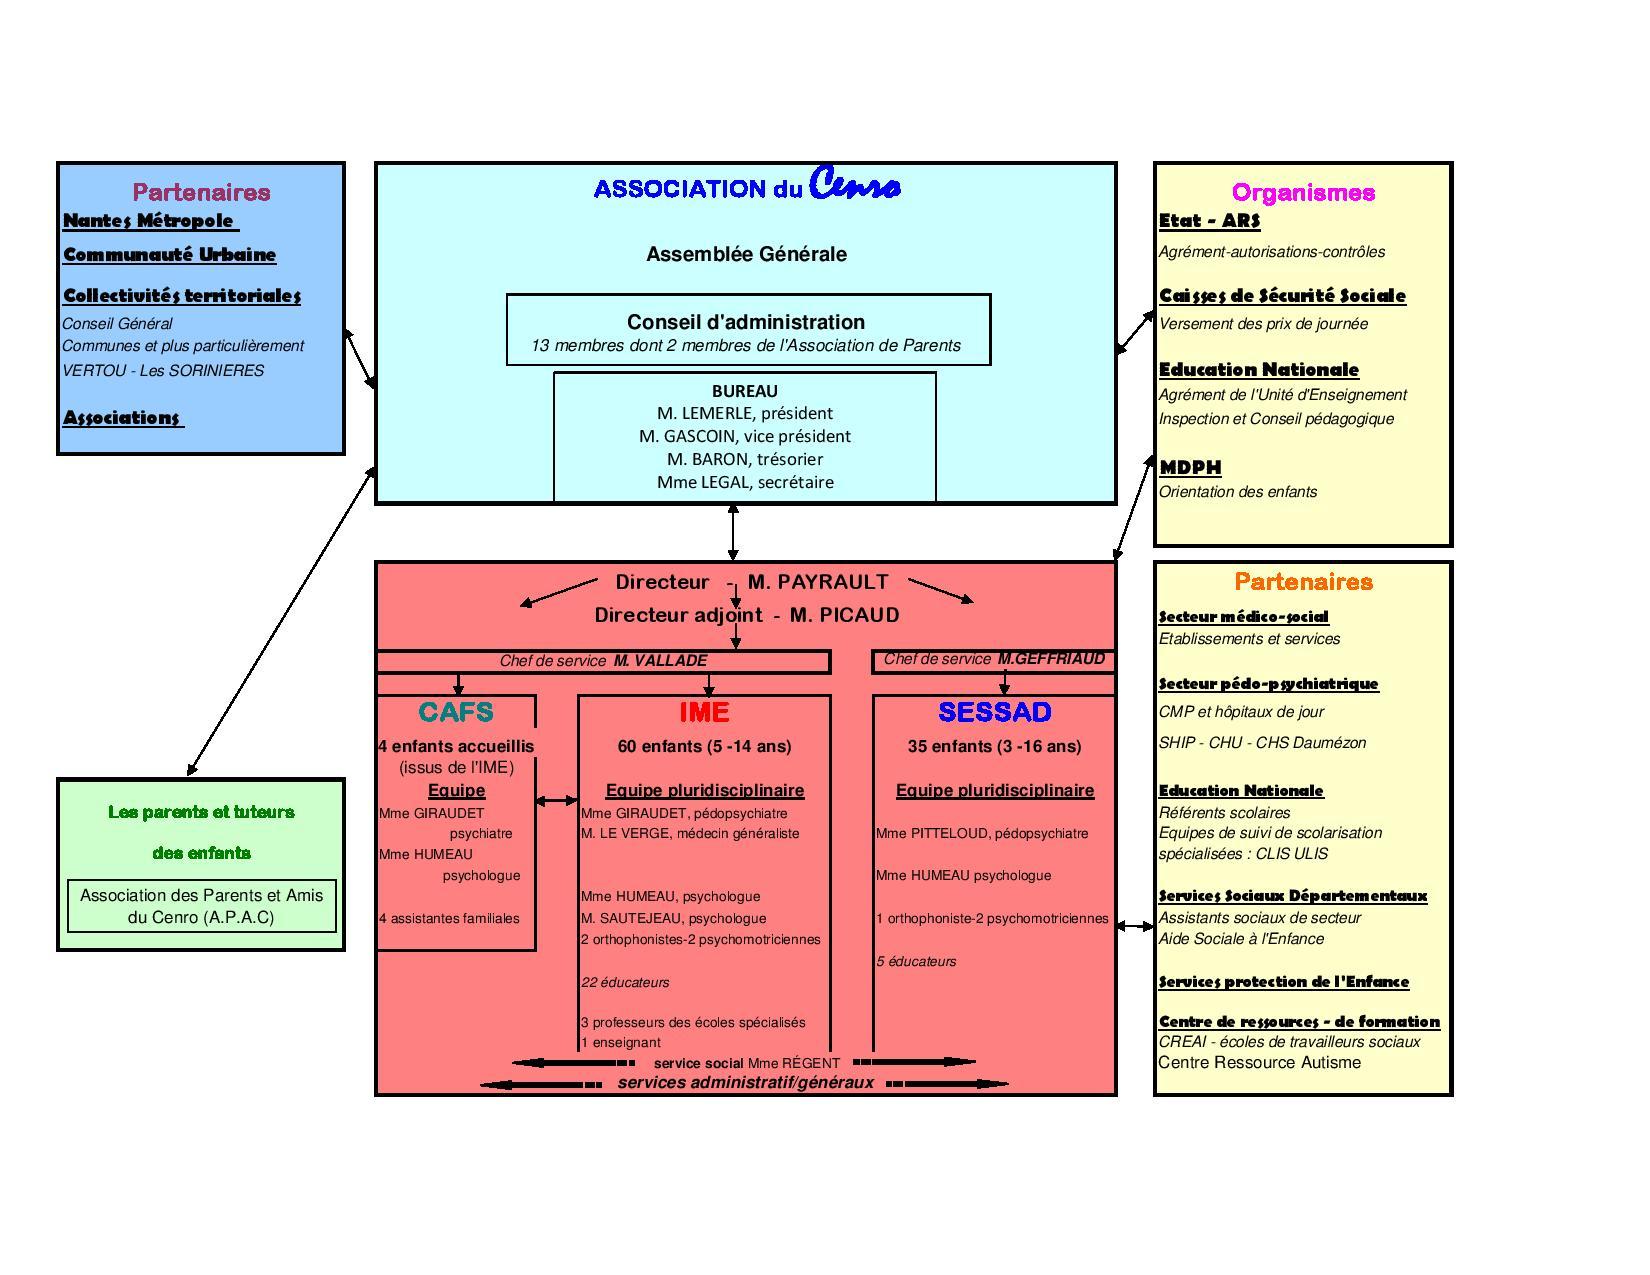 Organigramme CENRO 15 janv 18 (1)-page-001